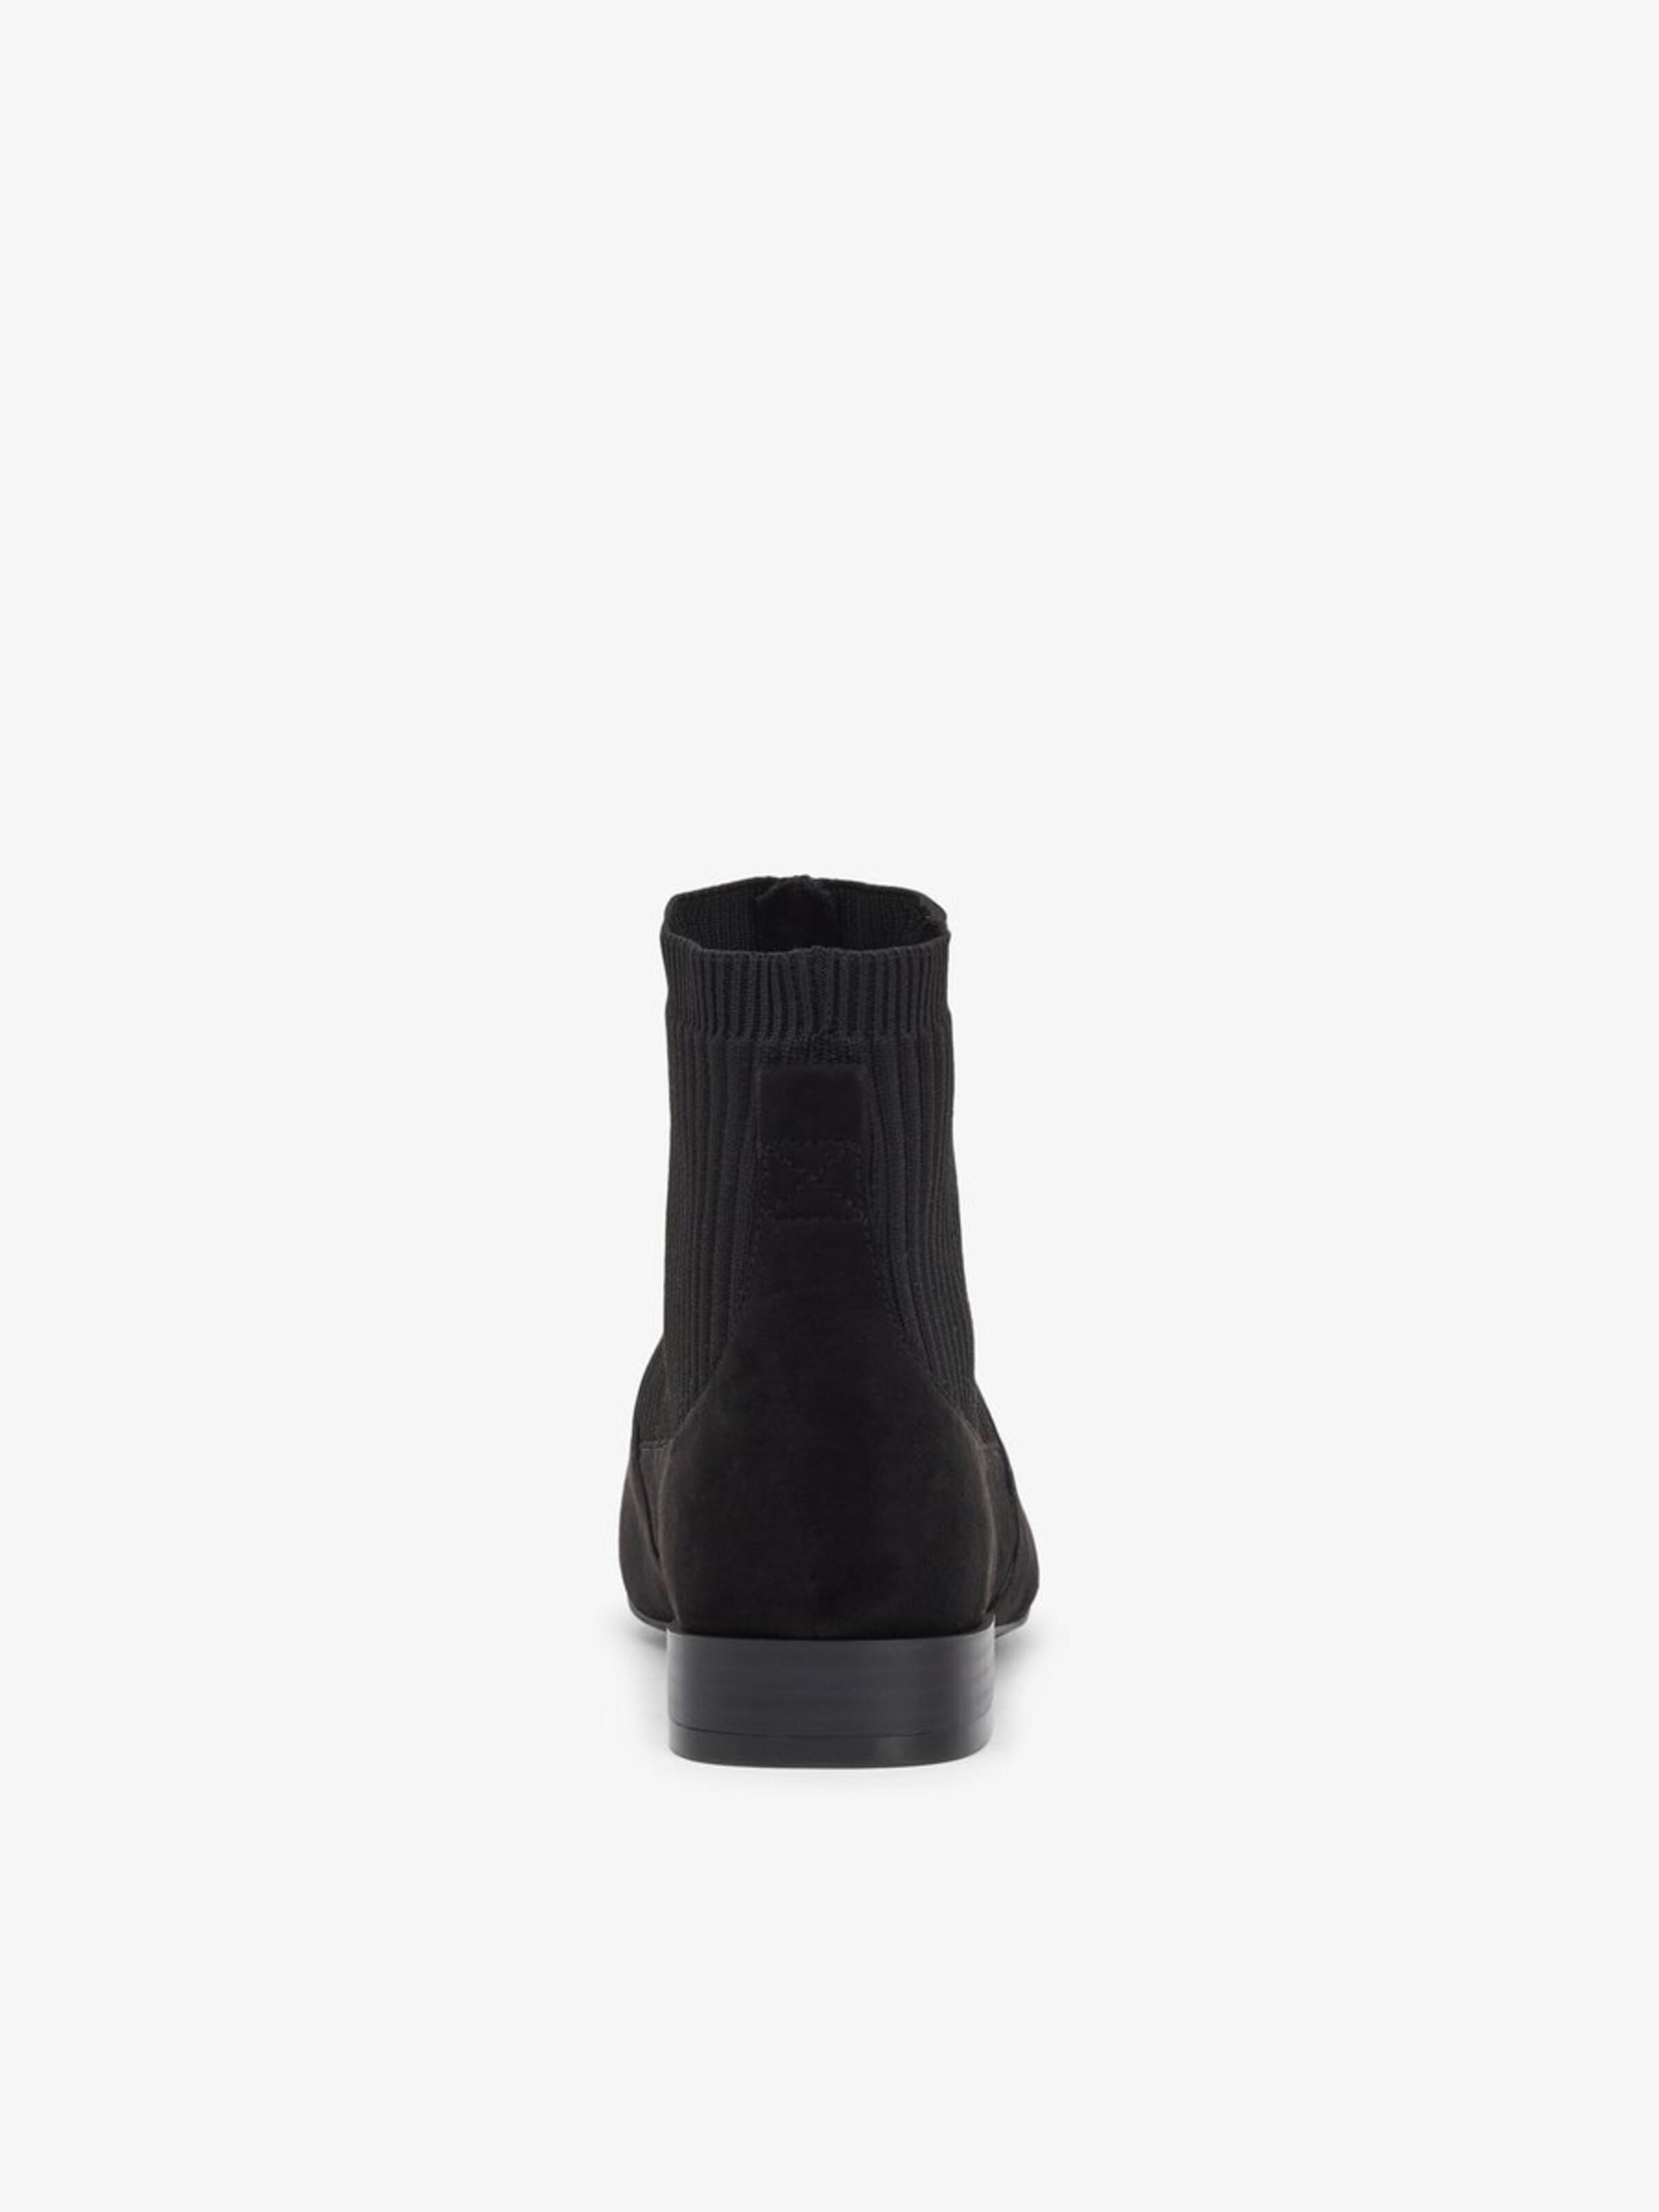 'anne' In BasaltgrauSchwarz Boots Chelsea Bianco Aj35qcR4L